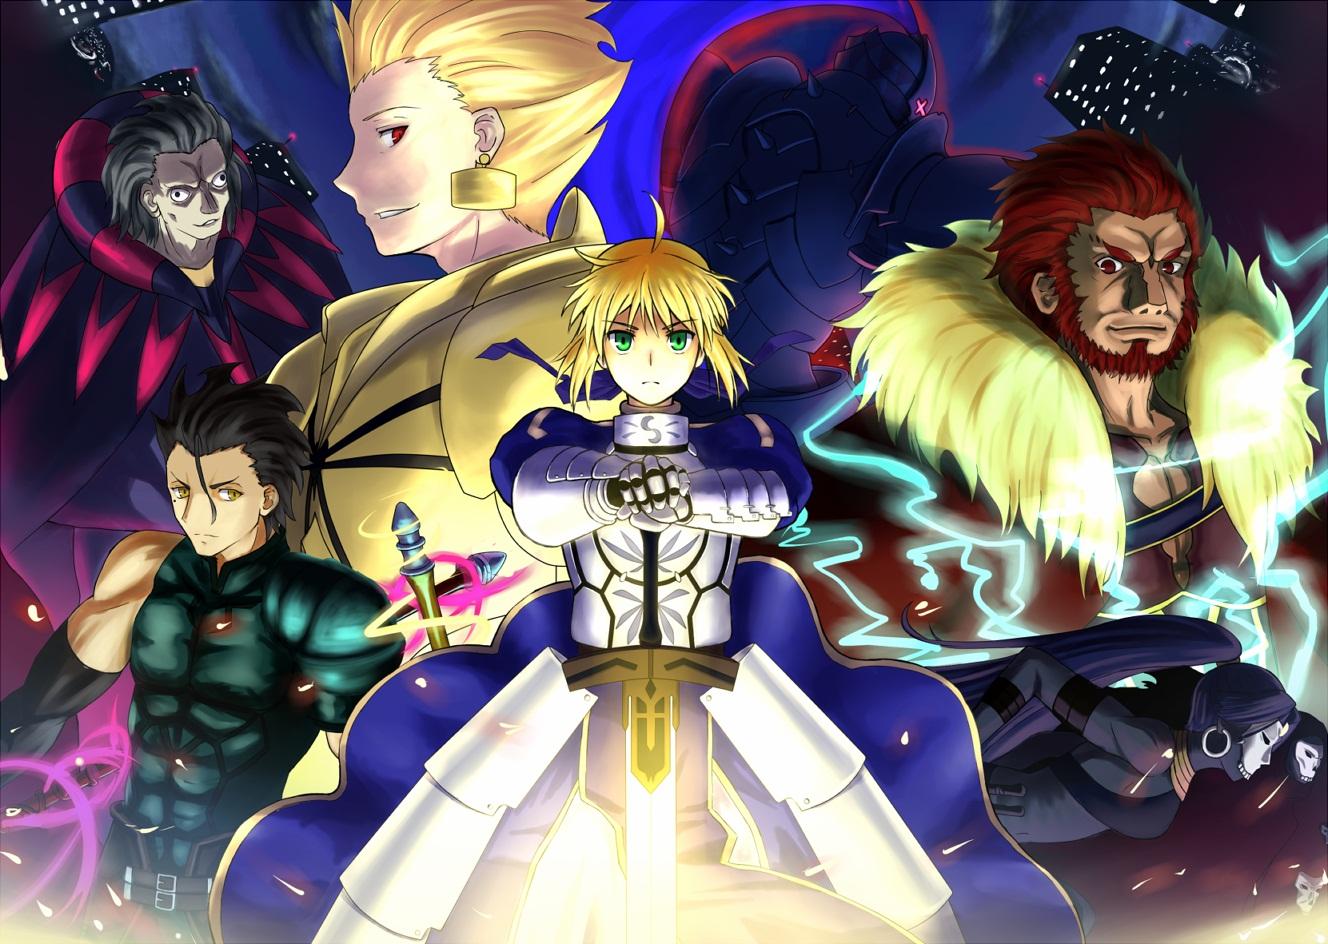 Bleach Anime Wallpapers Fate Zero HD Wallpaper   Anime Wallpaper HD 1328x944